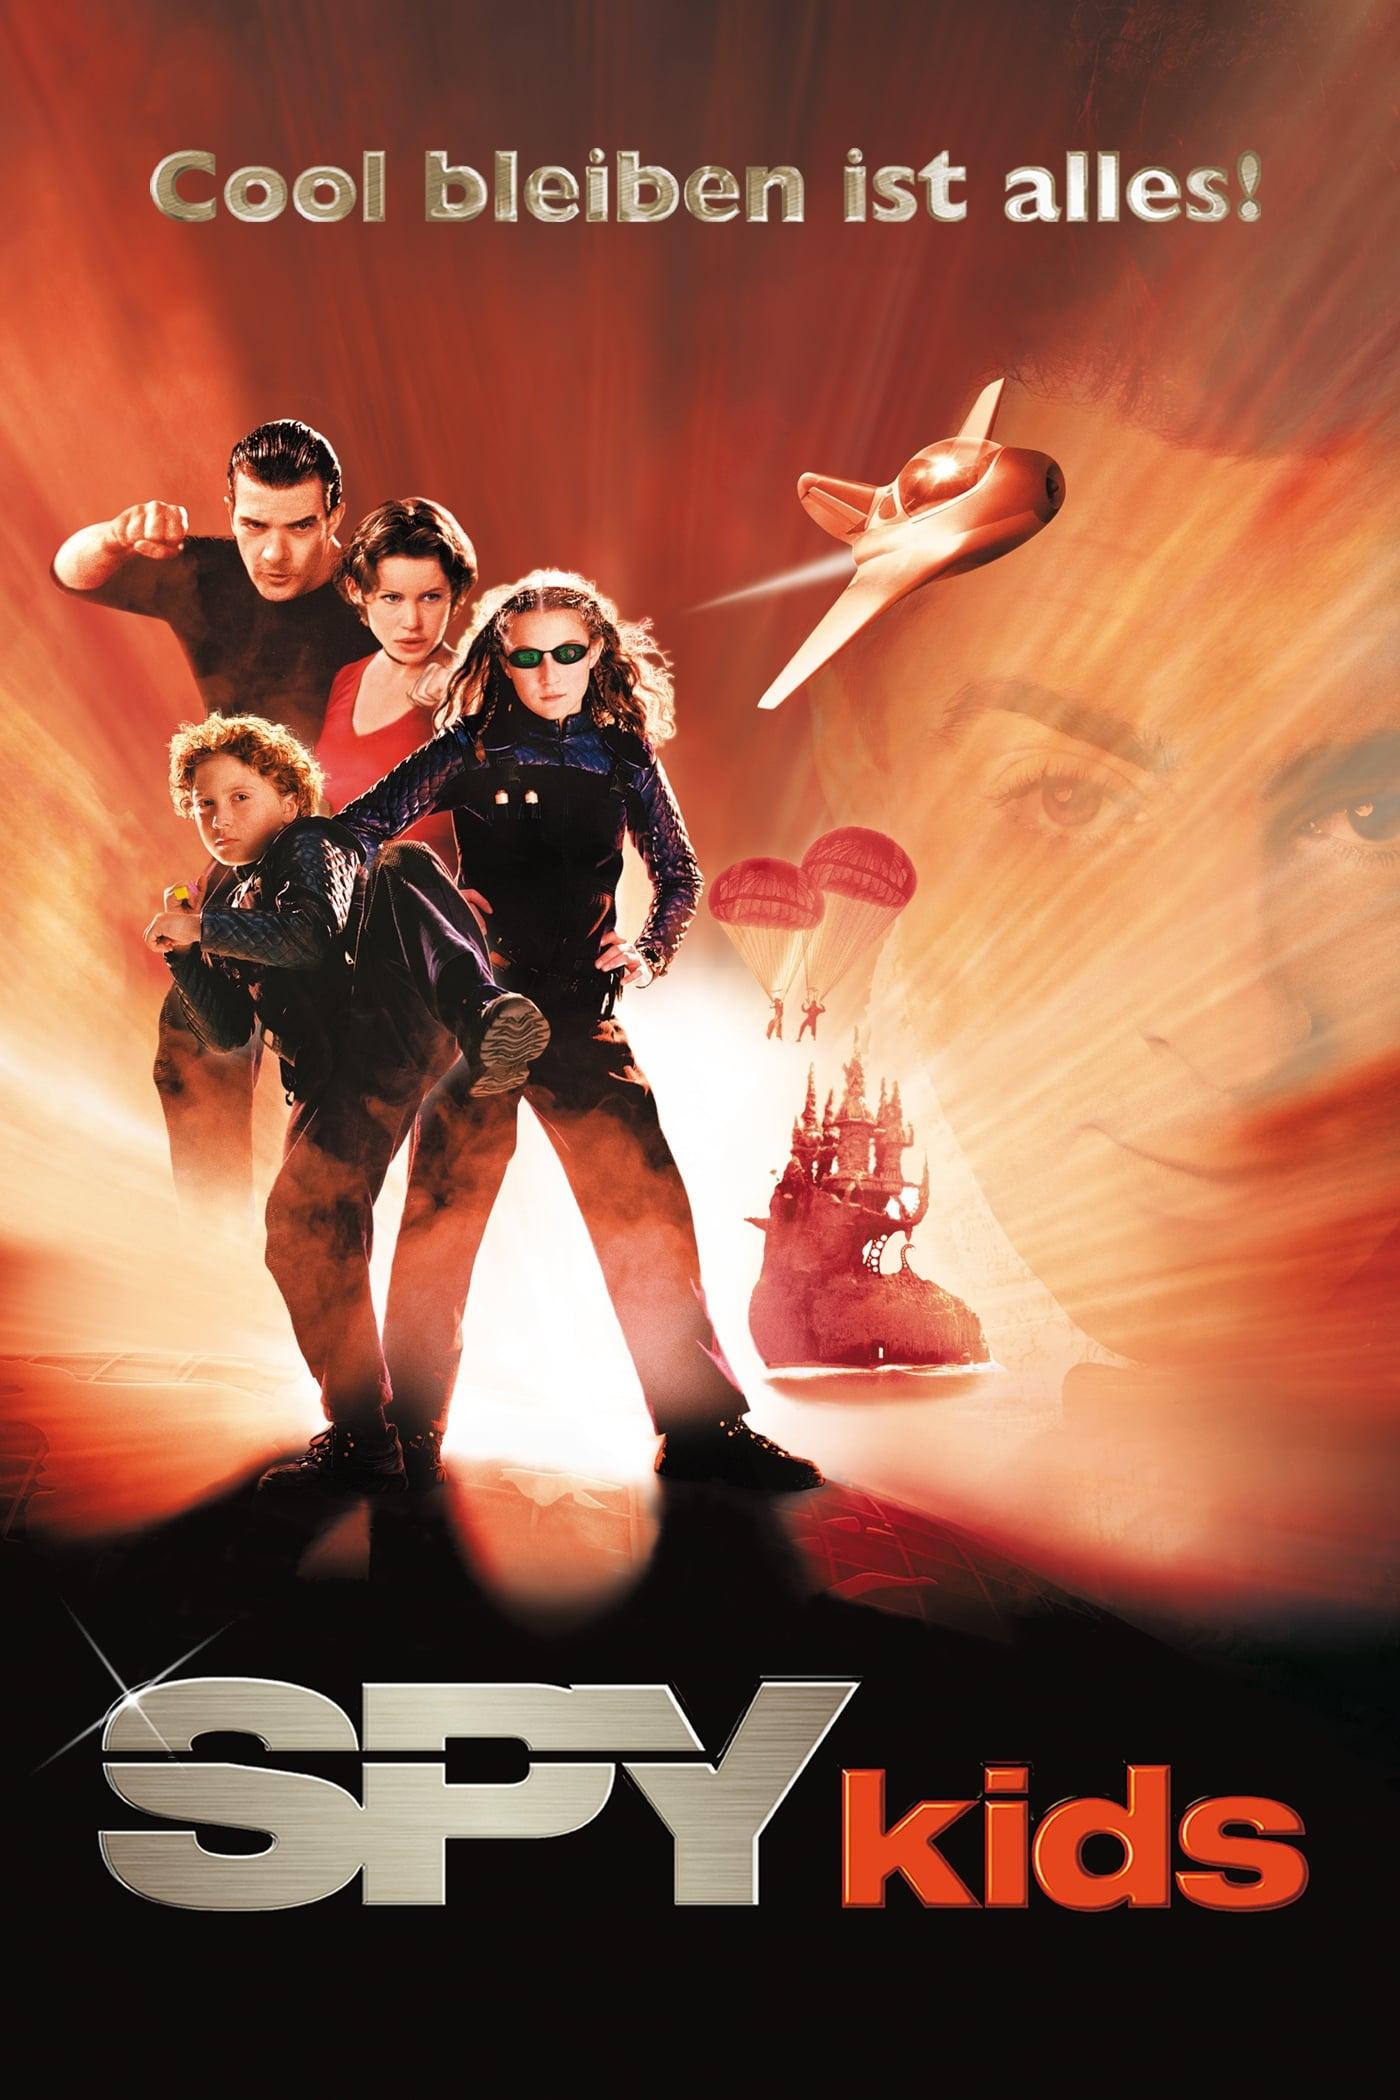 spy kids 2001 � moviesfilmcinecom